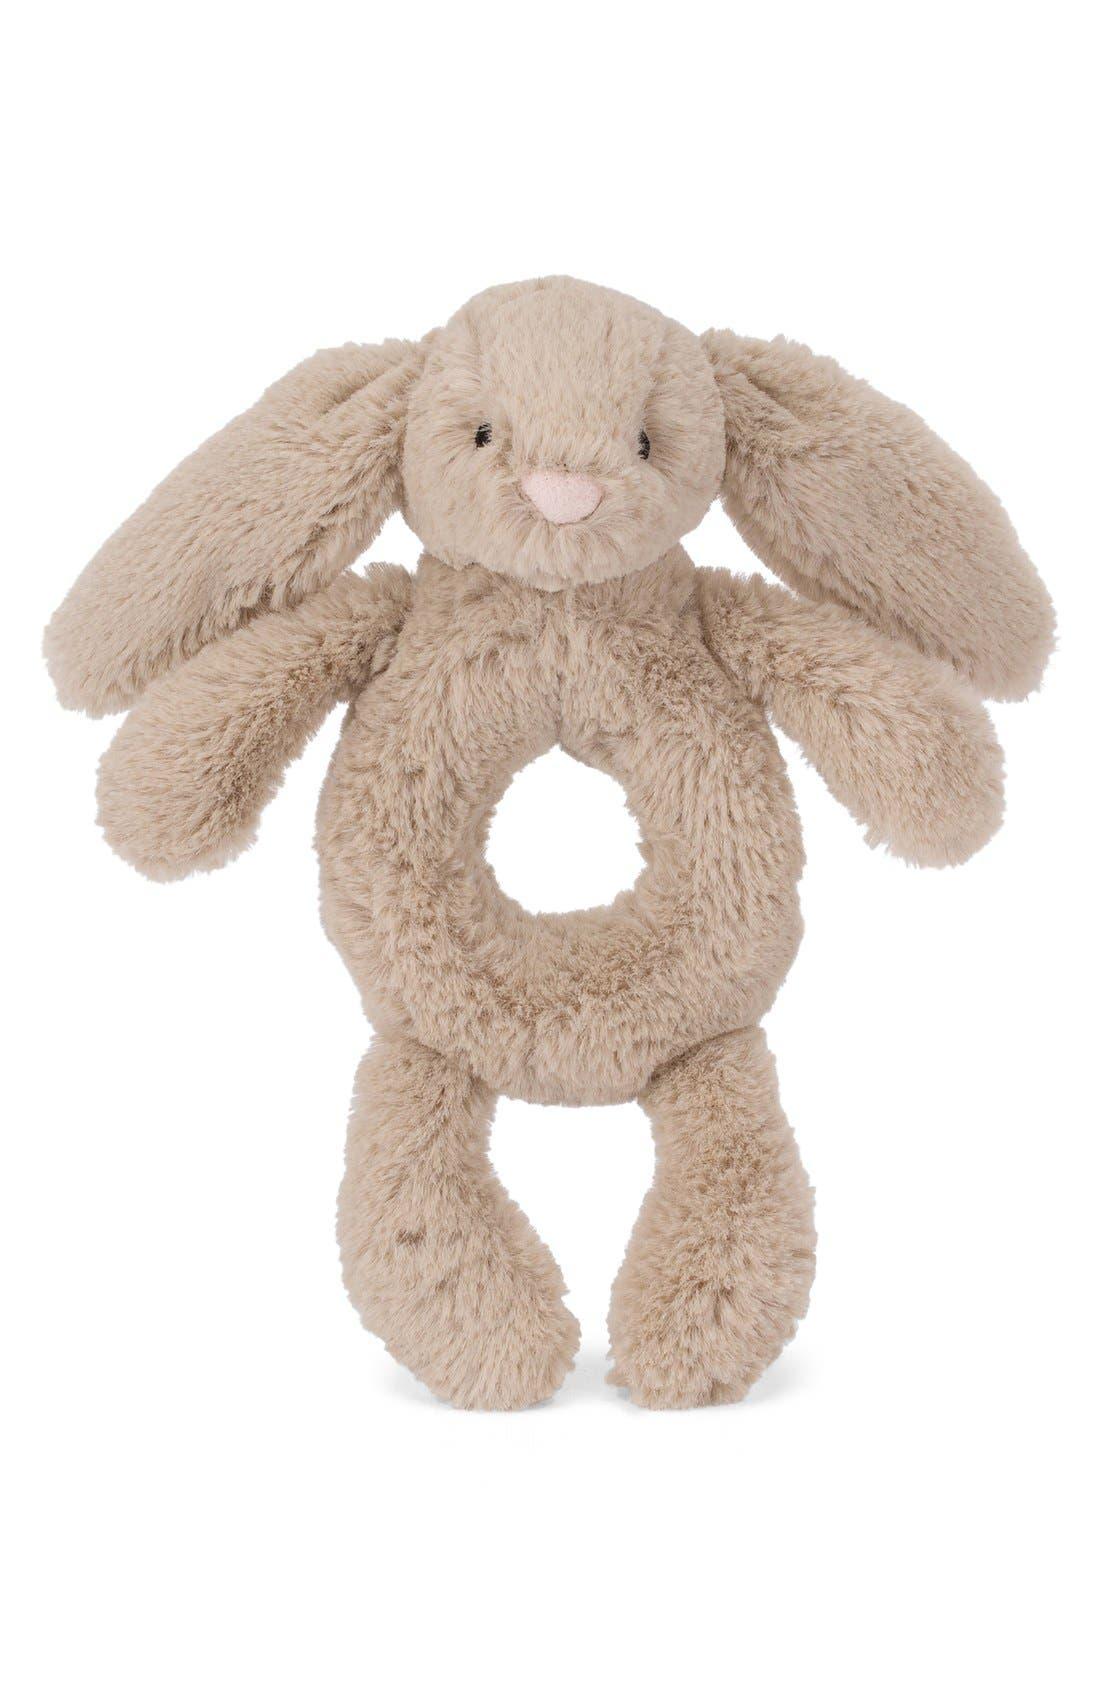 'Bashful Bunny' Grabber Rattle,                             Main thumbnail 1, color,                             BEIGE